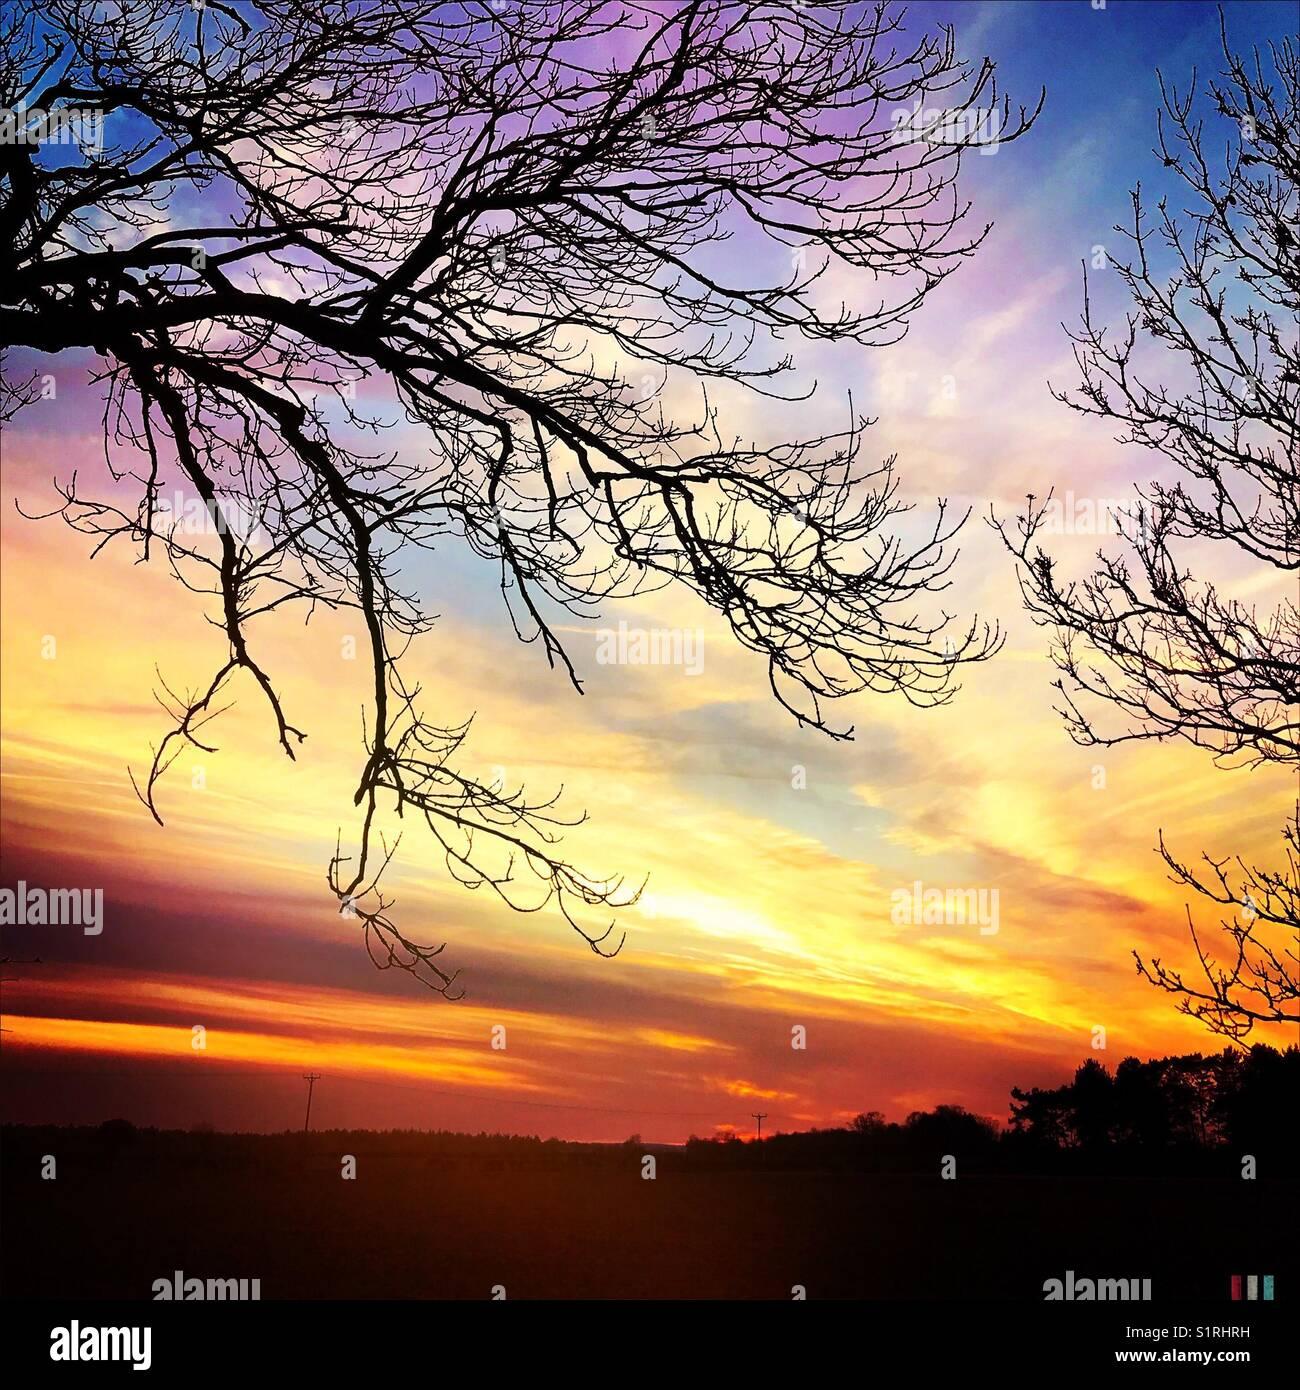 Autumnal Sunset - Stock Image